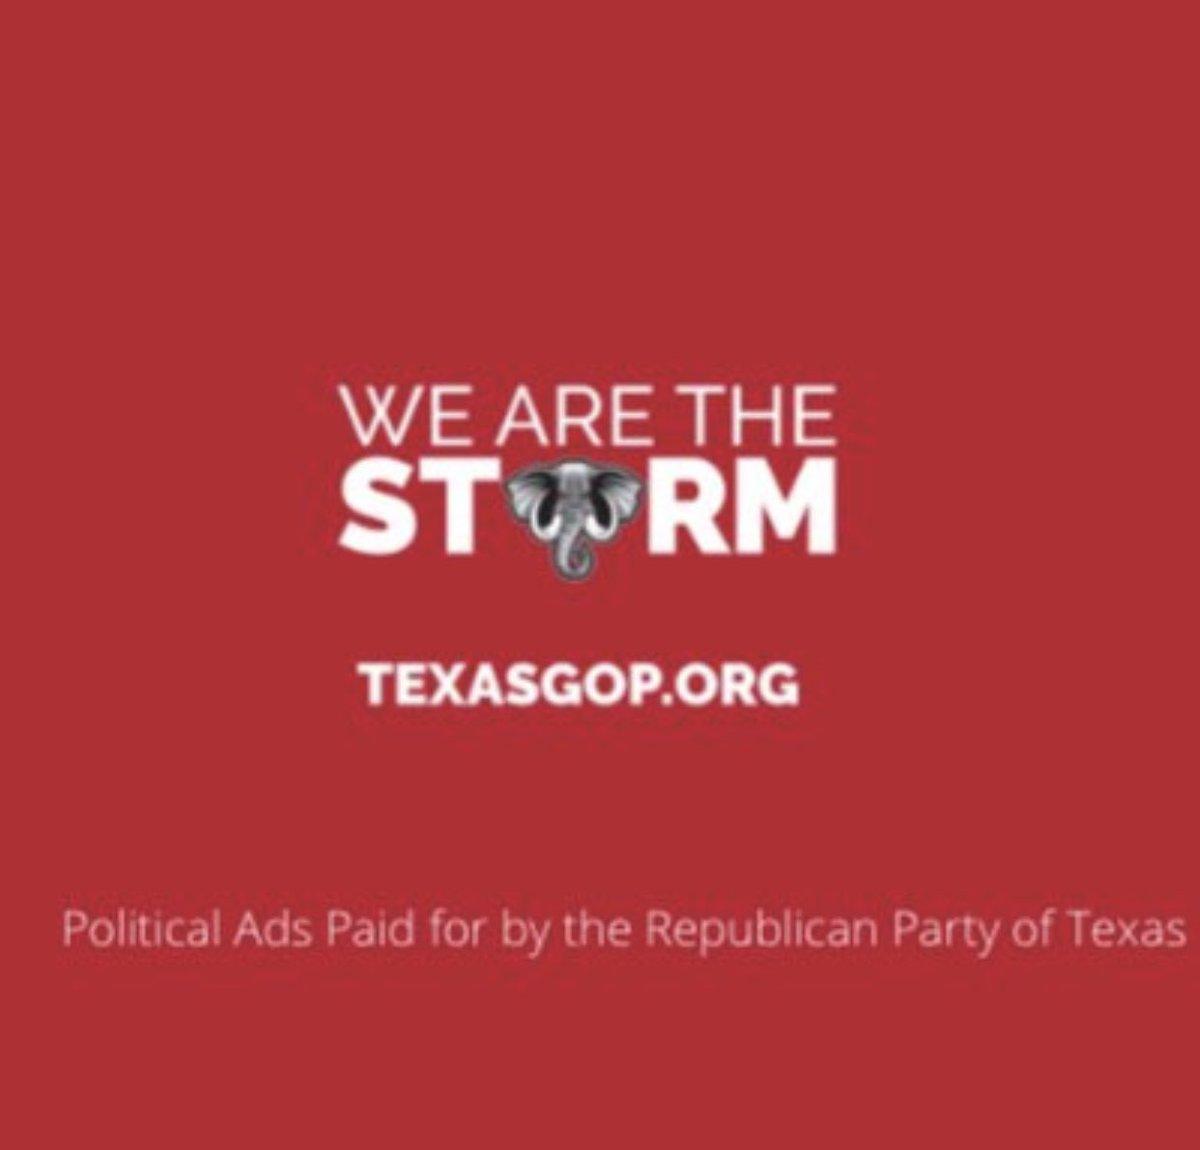 The @TexasGOP went full Qanon, this strikes me as bad